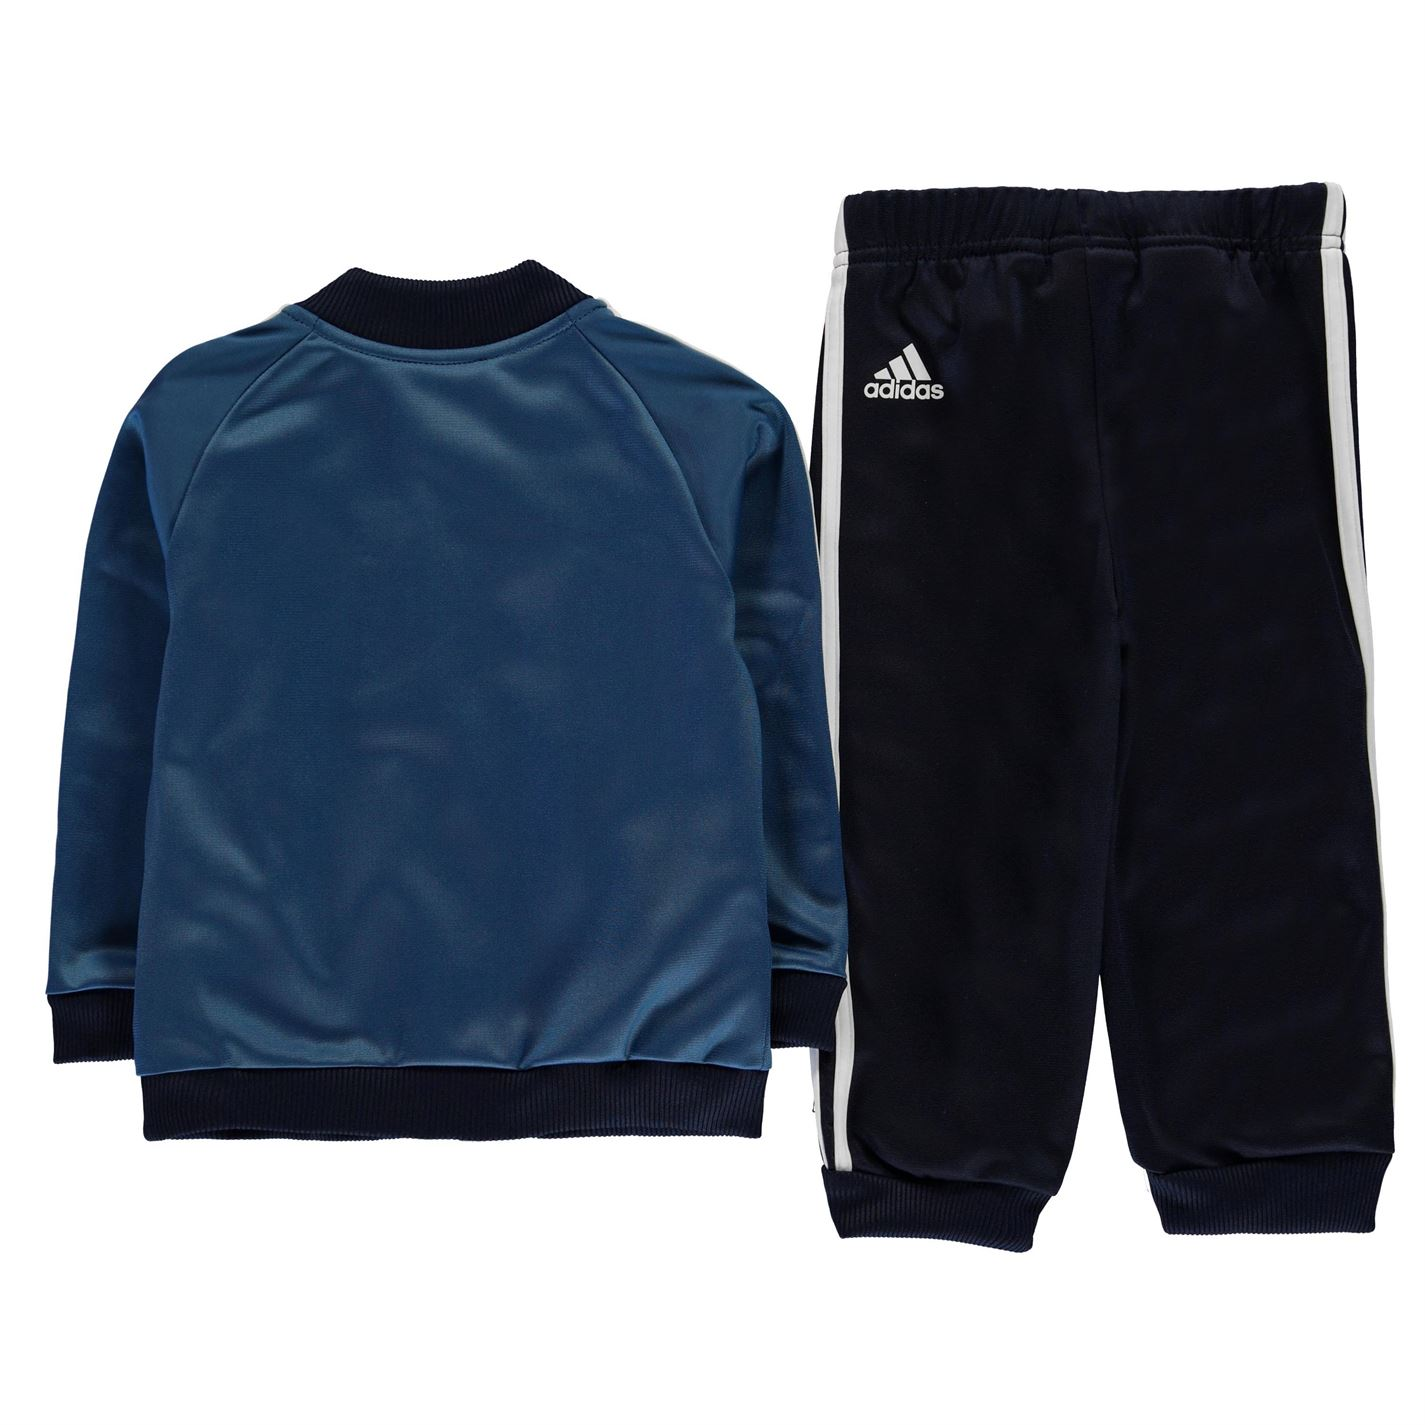 adidas 3S Poly Track Suit Infants Boys Tracksuit Zip Stripe ... 78b645a21